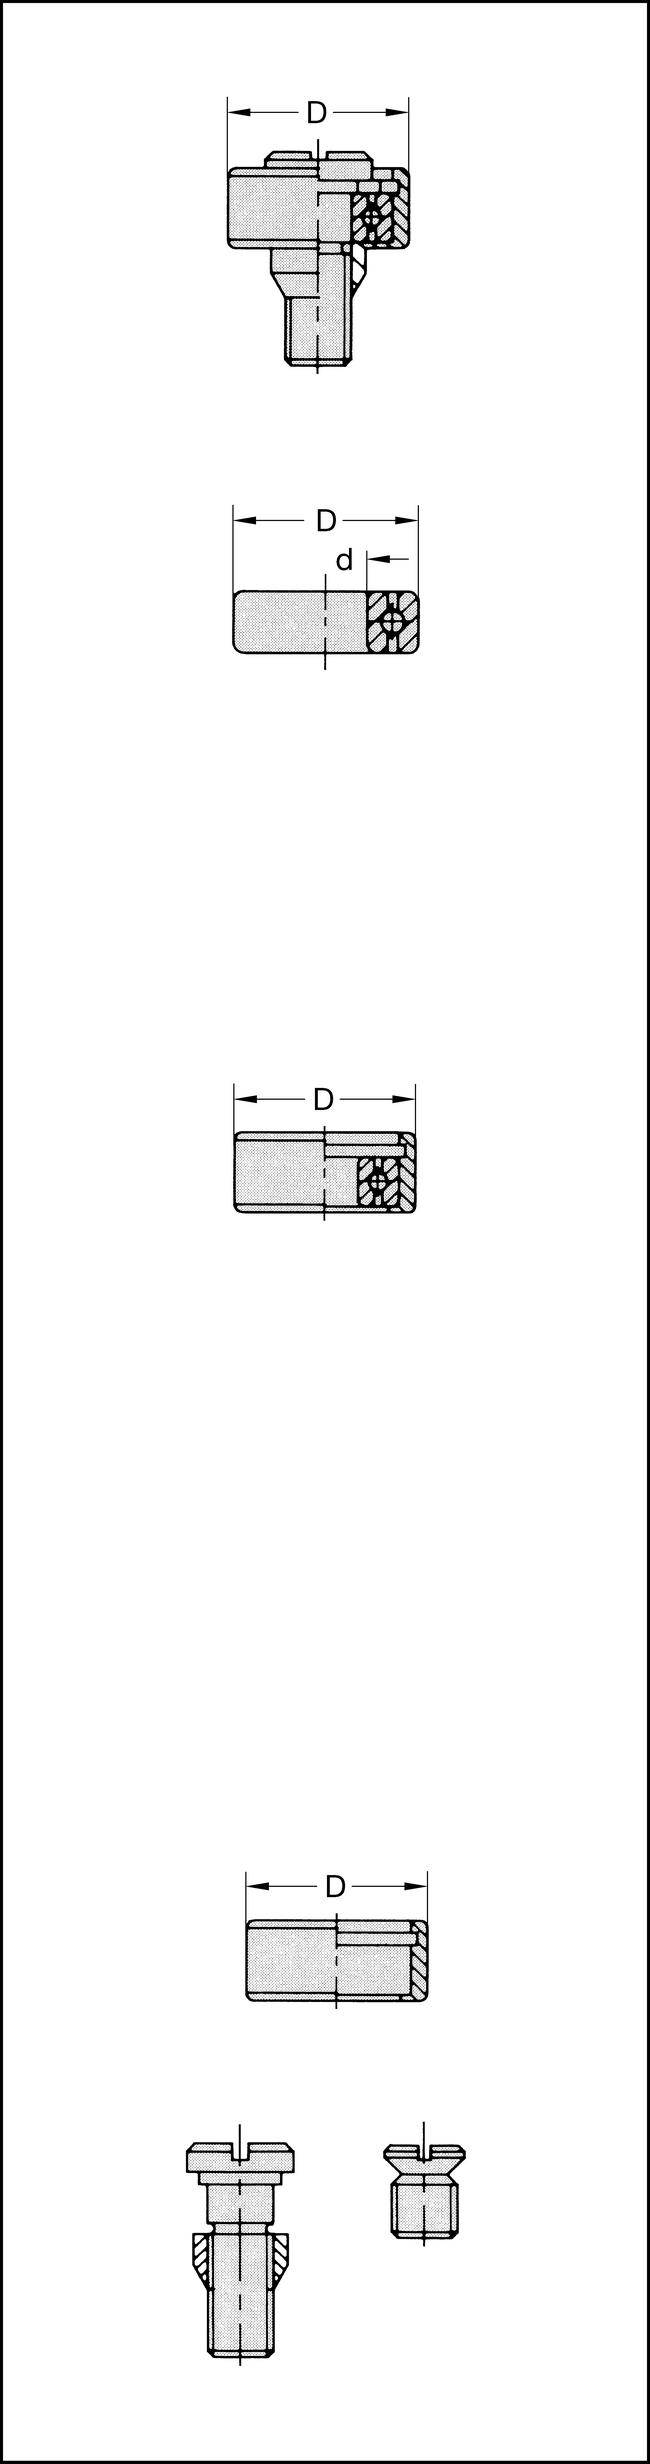 Kugellager 15,9x5mm d=6,35mm